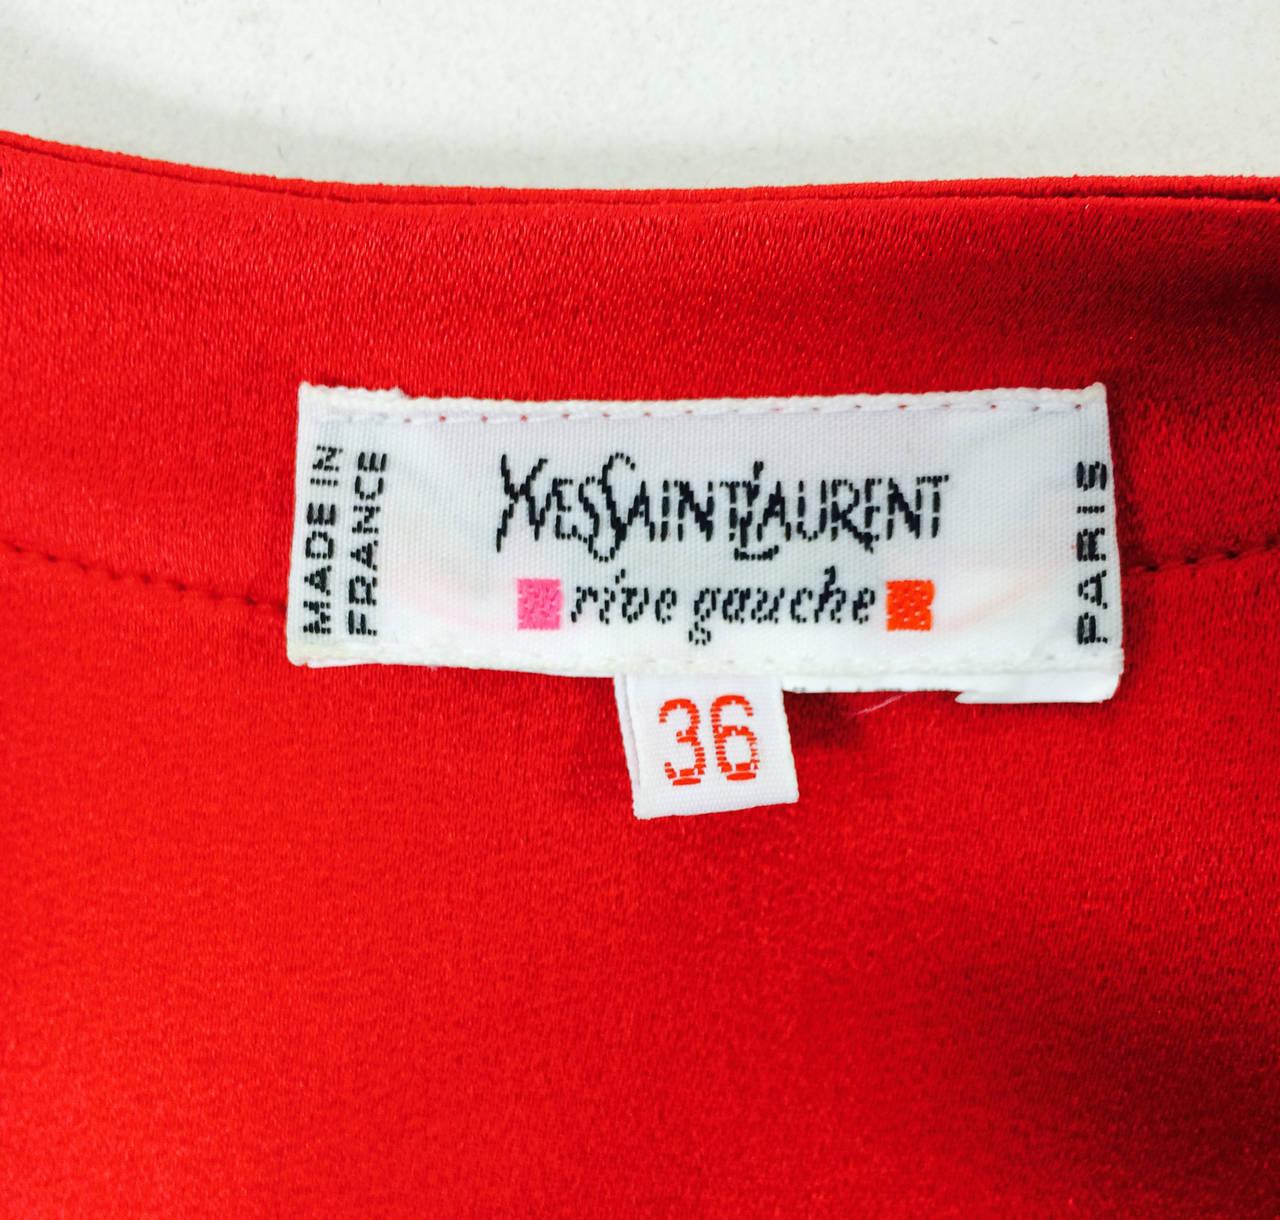 Yves St Laurent YSL Rive Gauche red satin back crepe sleeveless top 8